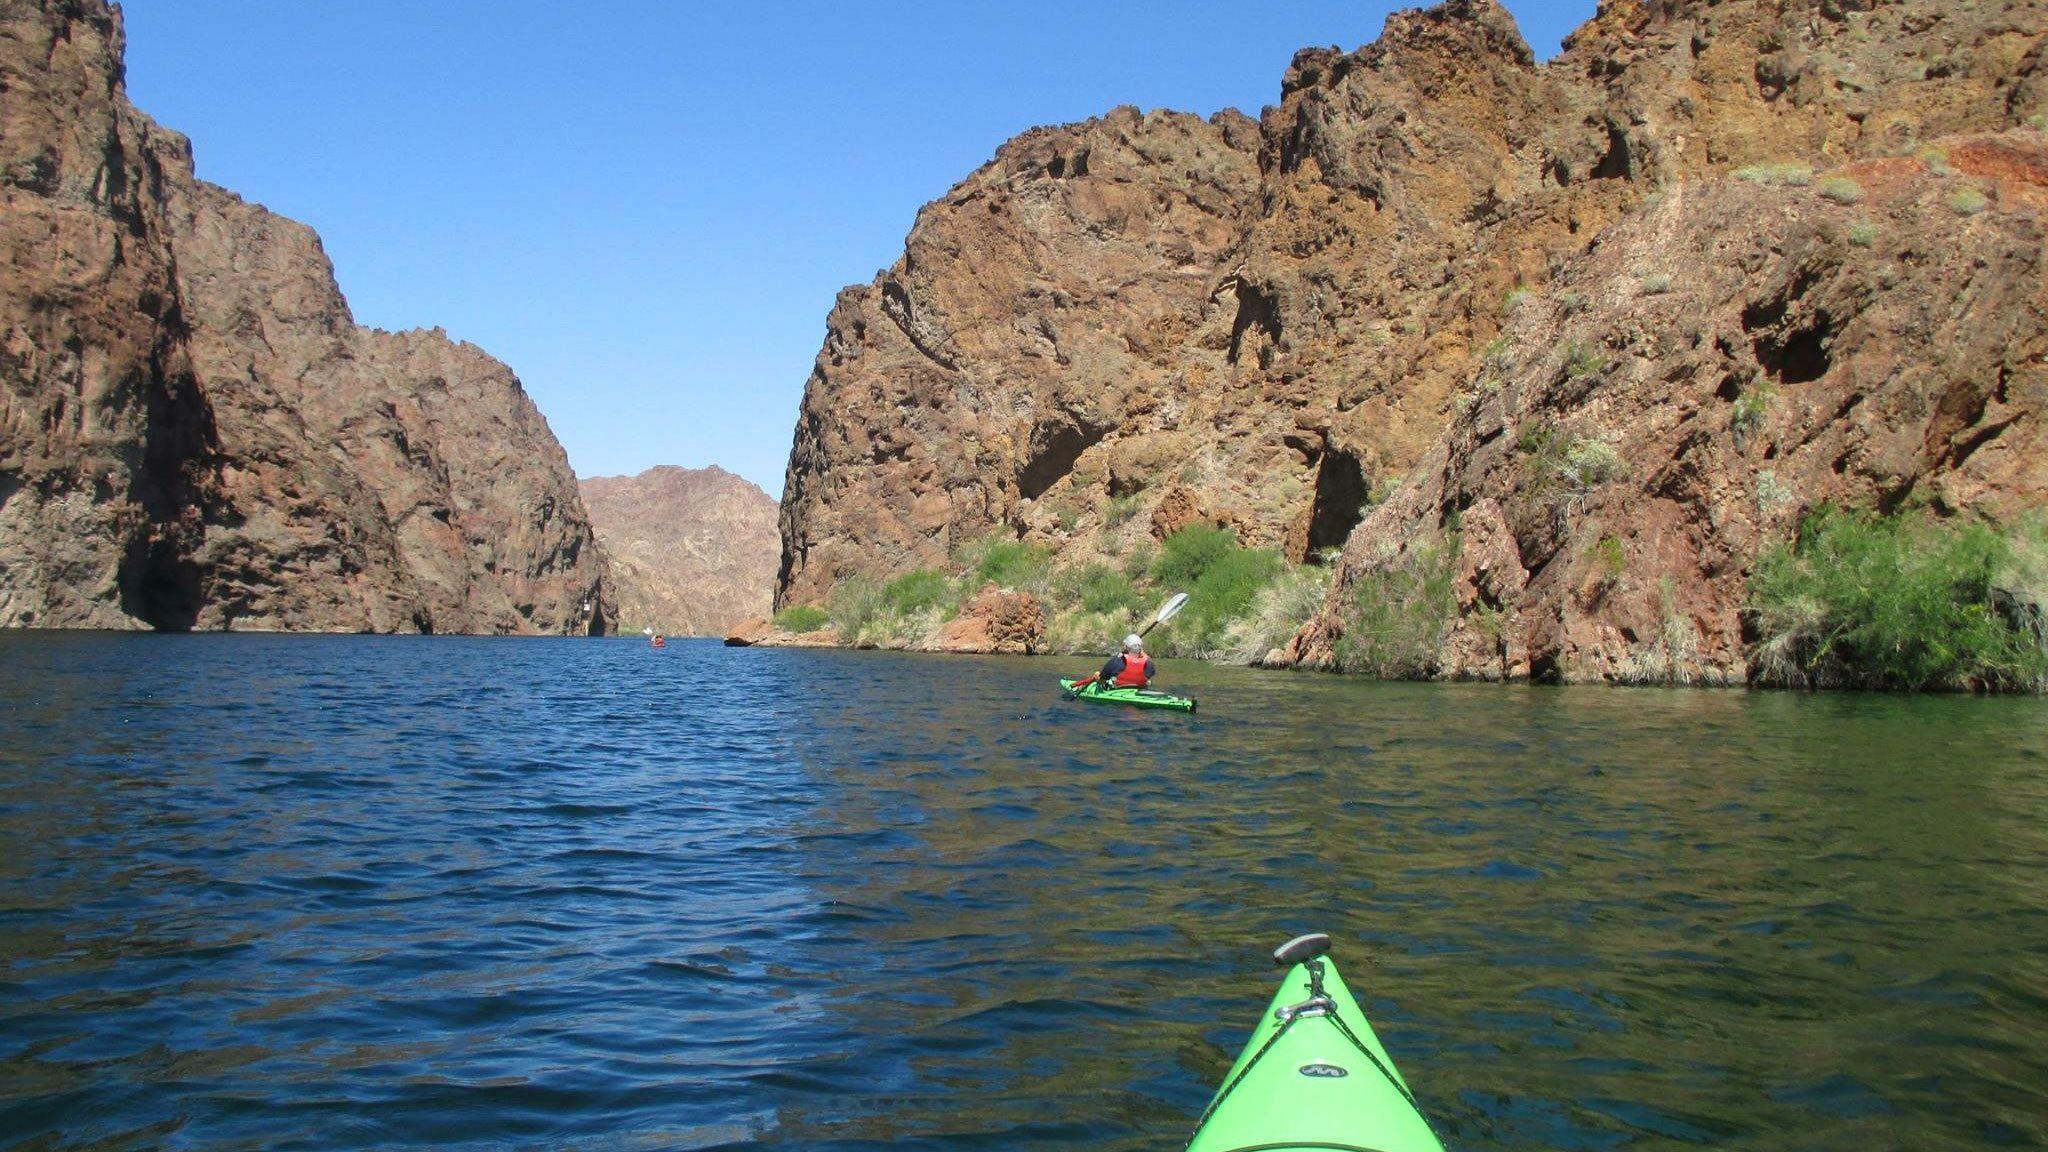 Two kayakers paddling down Colorado river